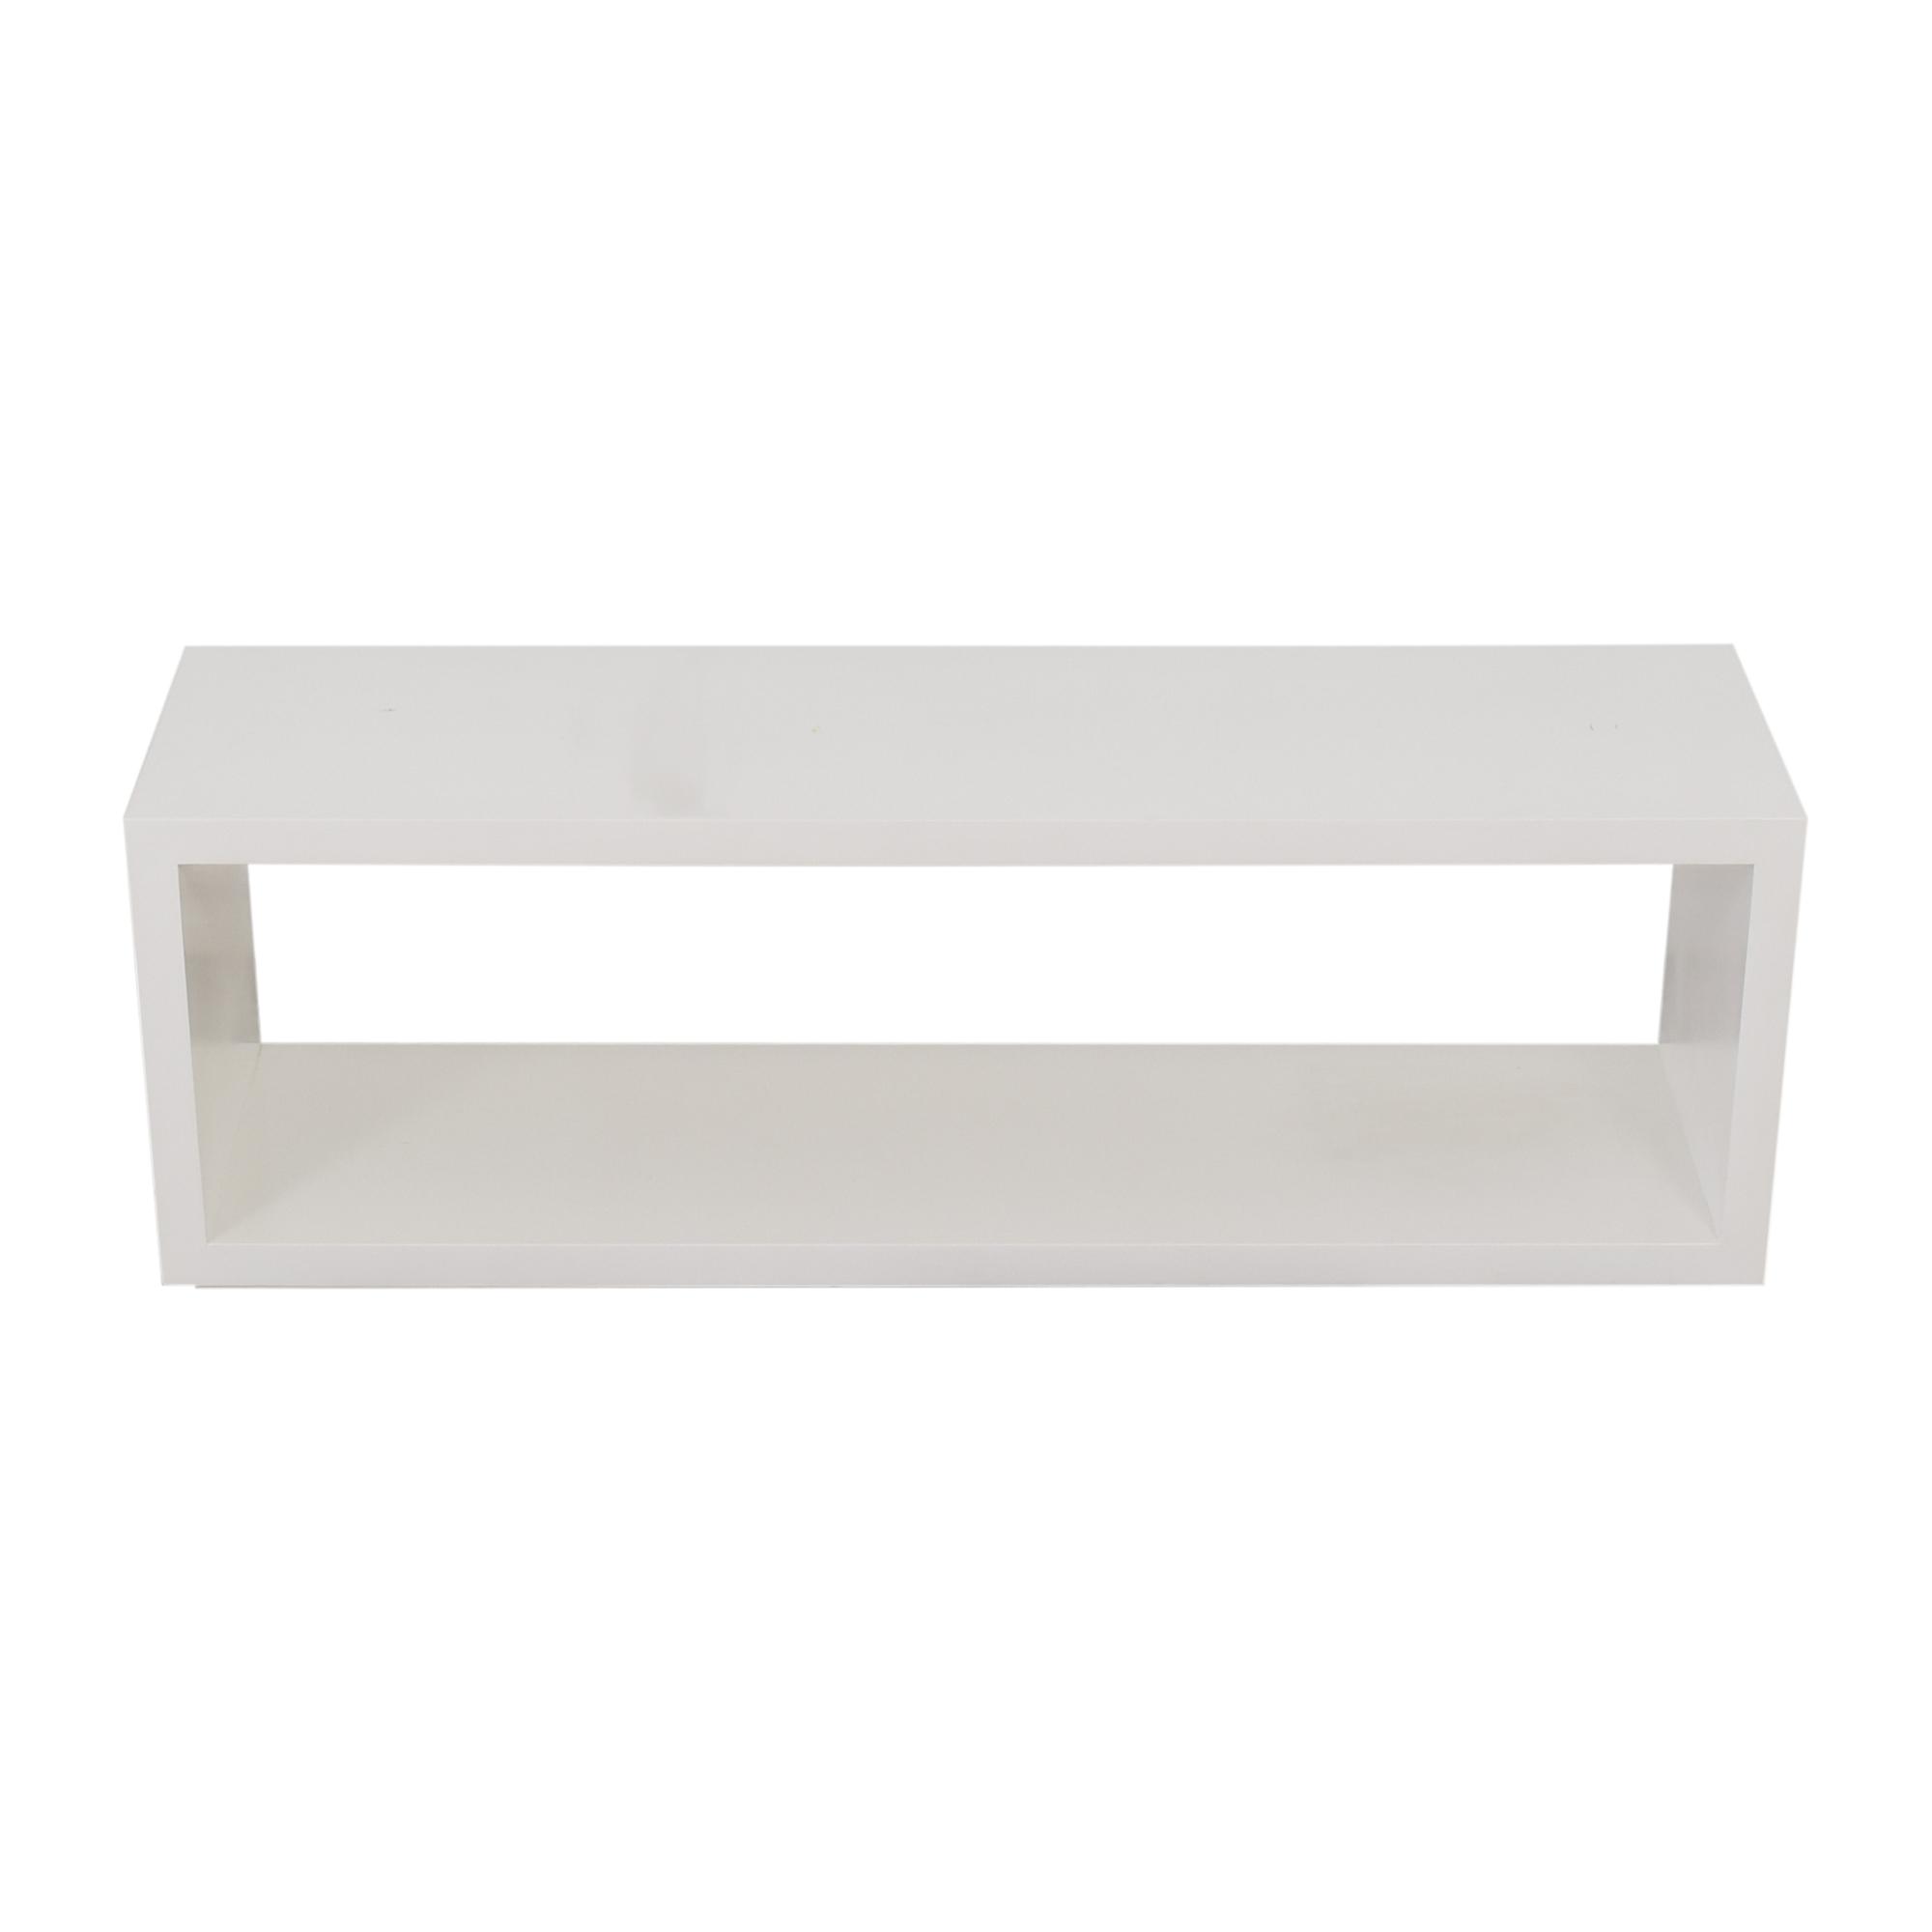 buy Crate & Barrel Aspect Modular Open Storage Unit Crate & Barrel Bookcases & Shelving